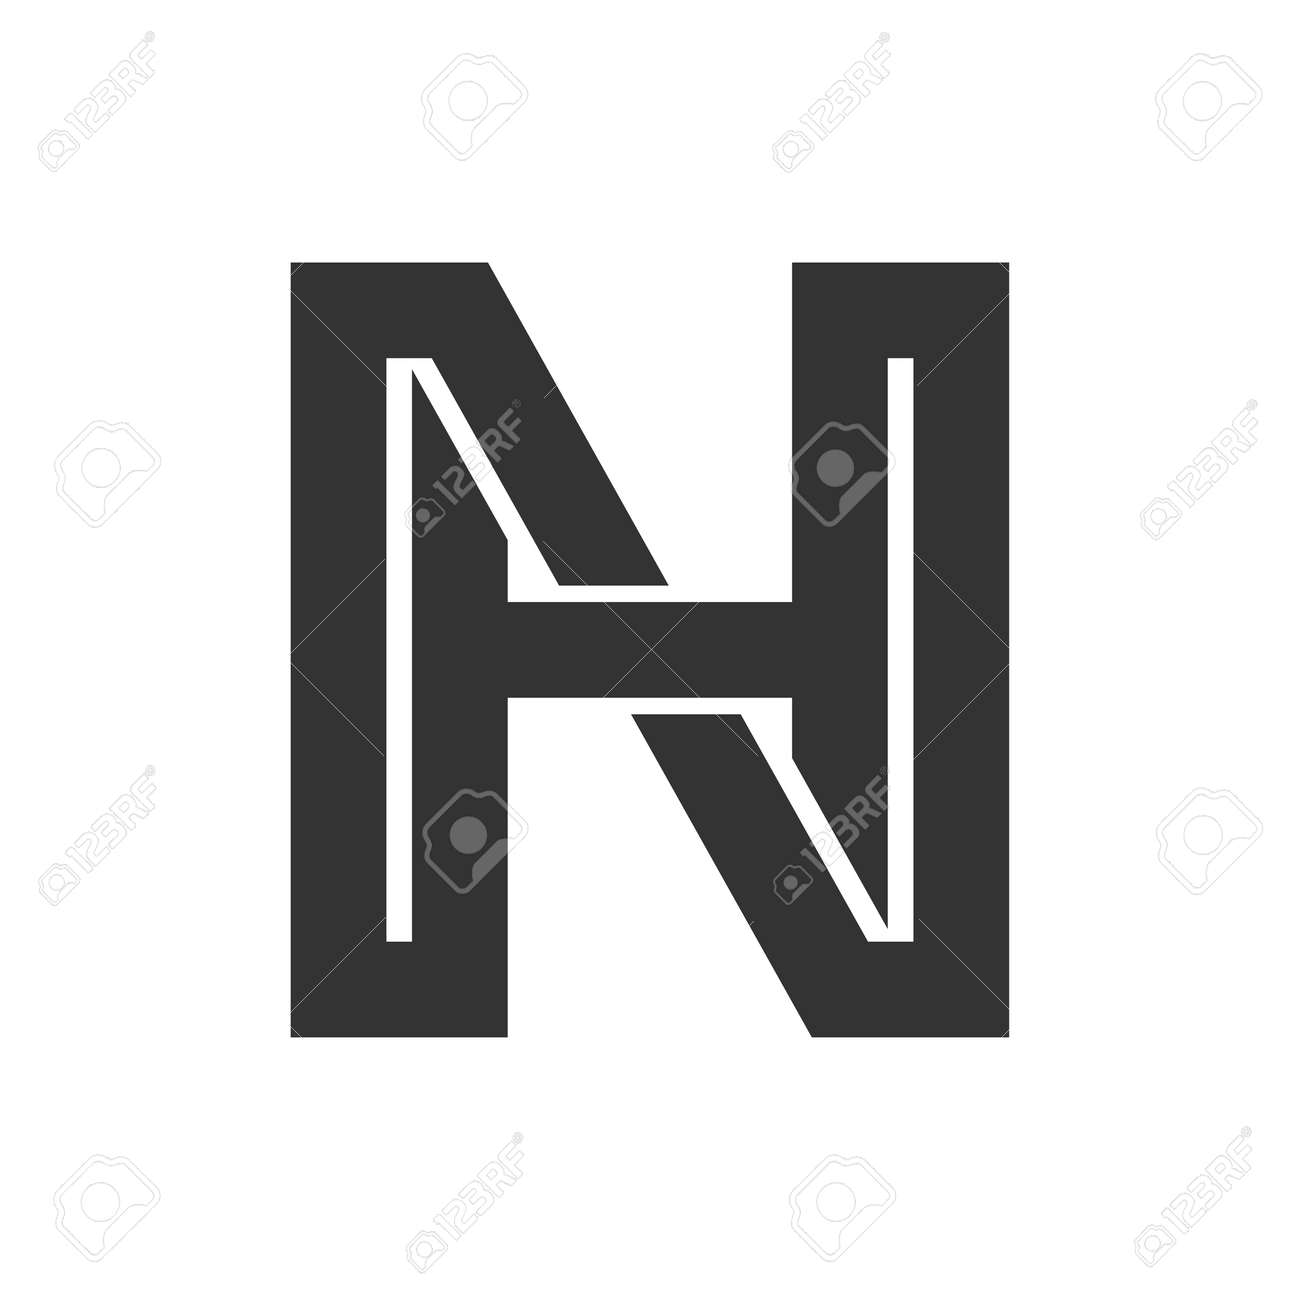 Creative abstract letter hn design. Linked letter nh design. - 165402685